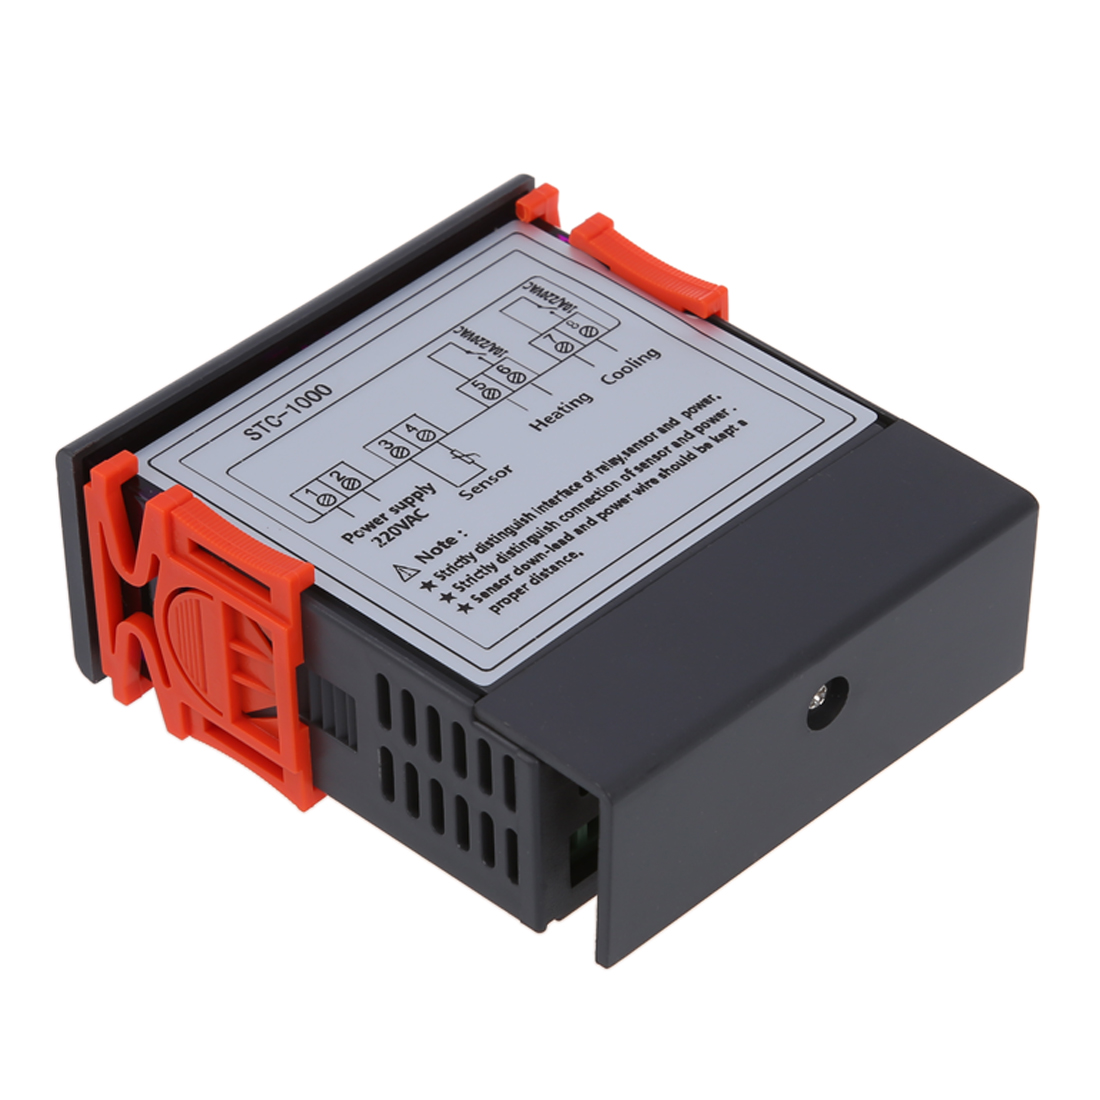 220v Digital Stc 1000 Temperature Controller Thermostat Regulator How To Wire Sensor Ed